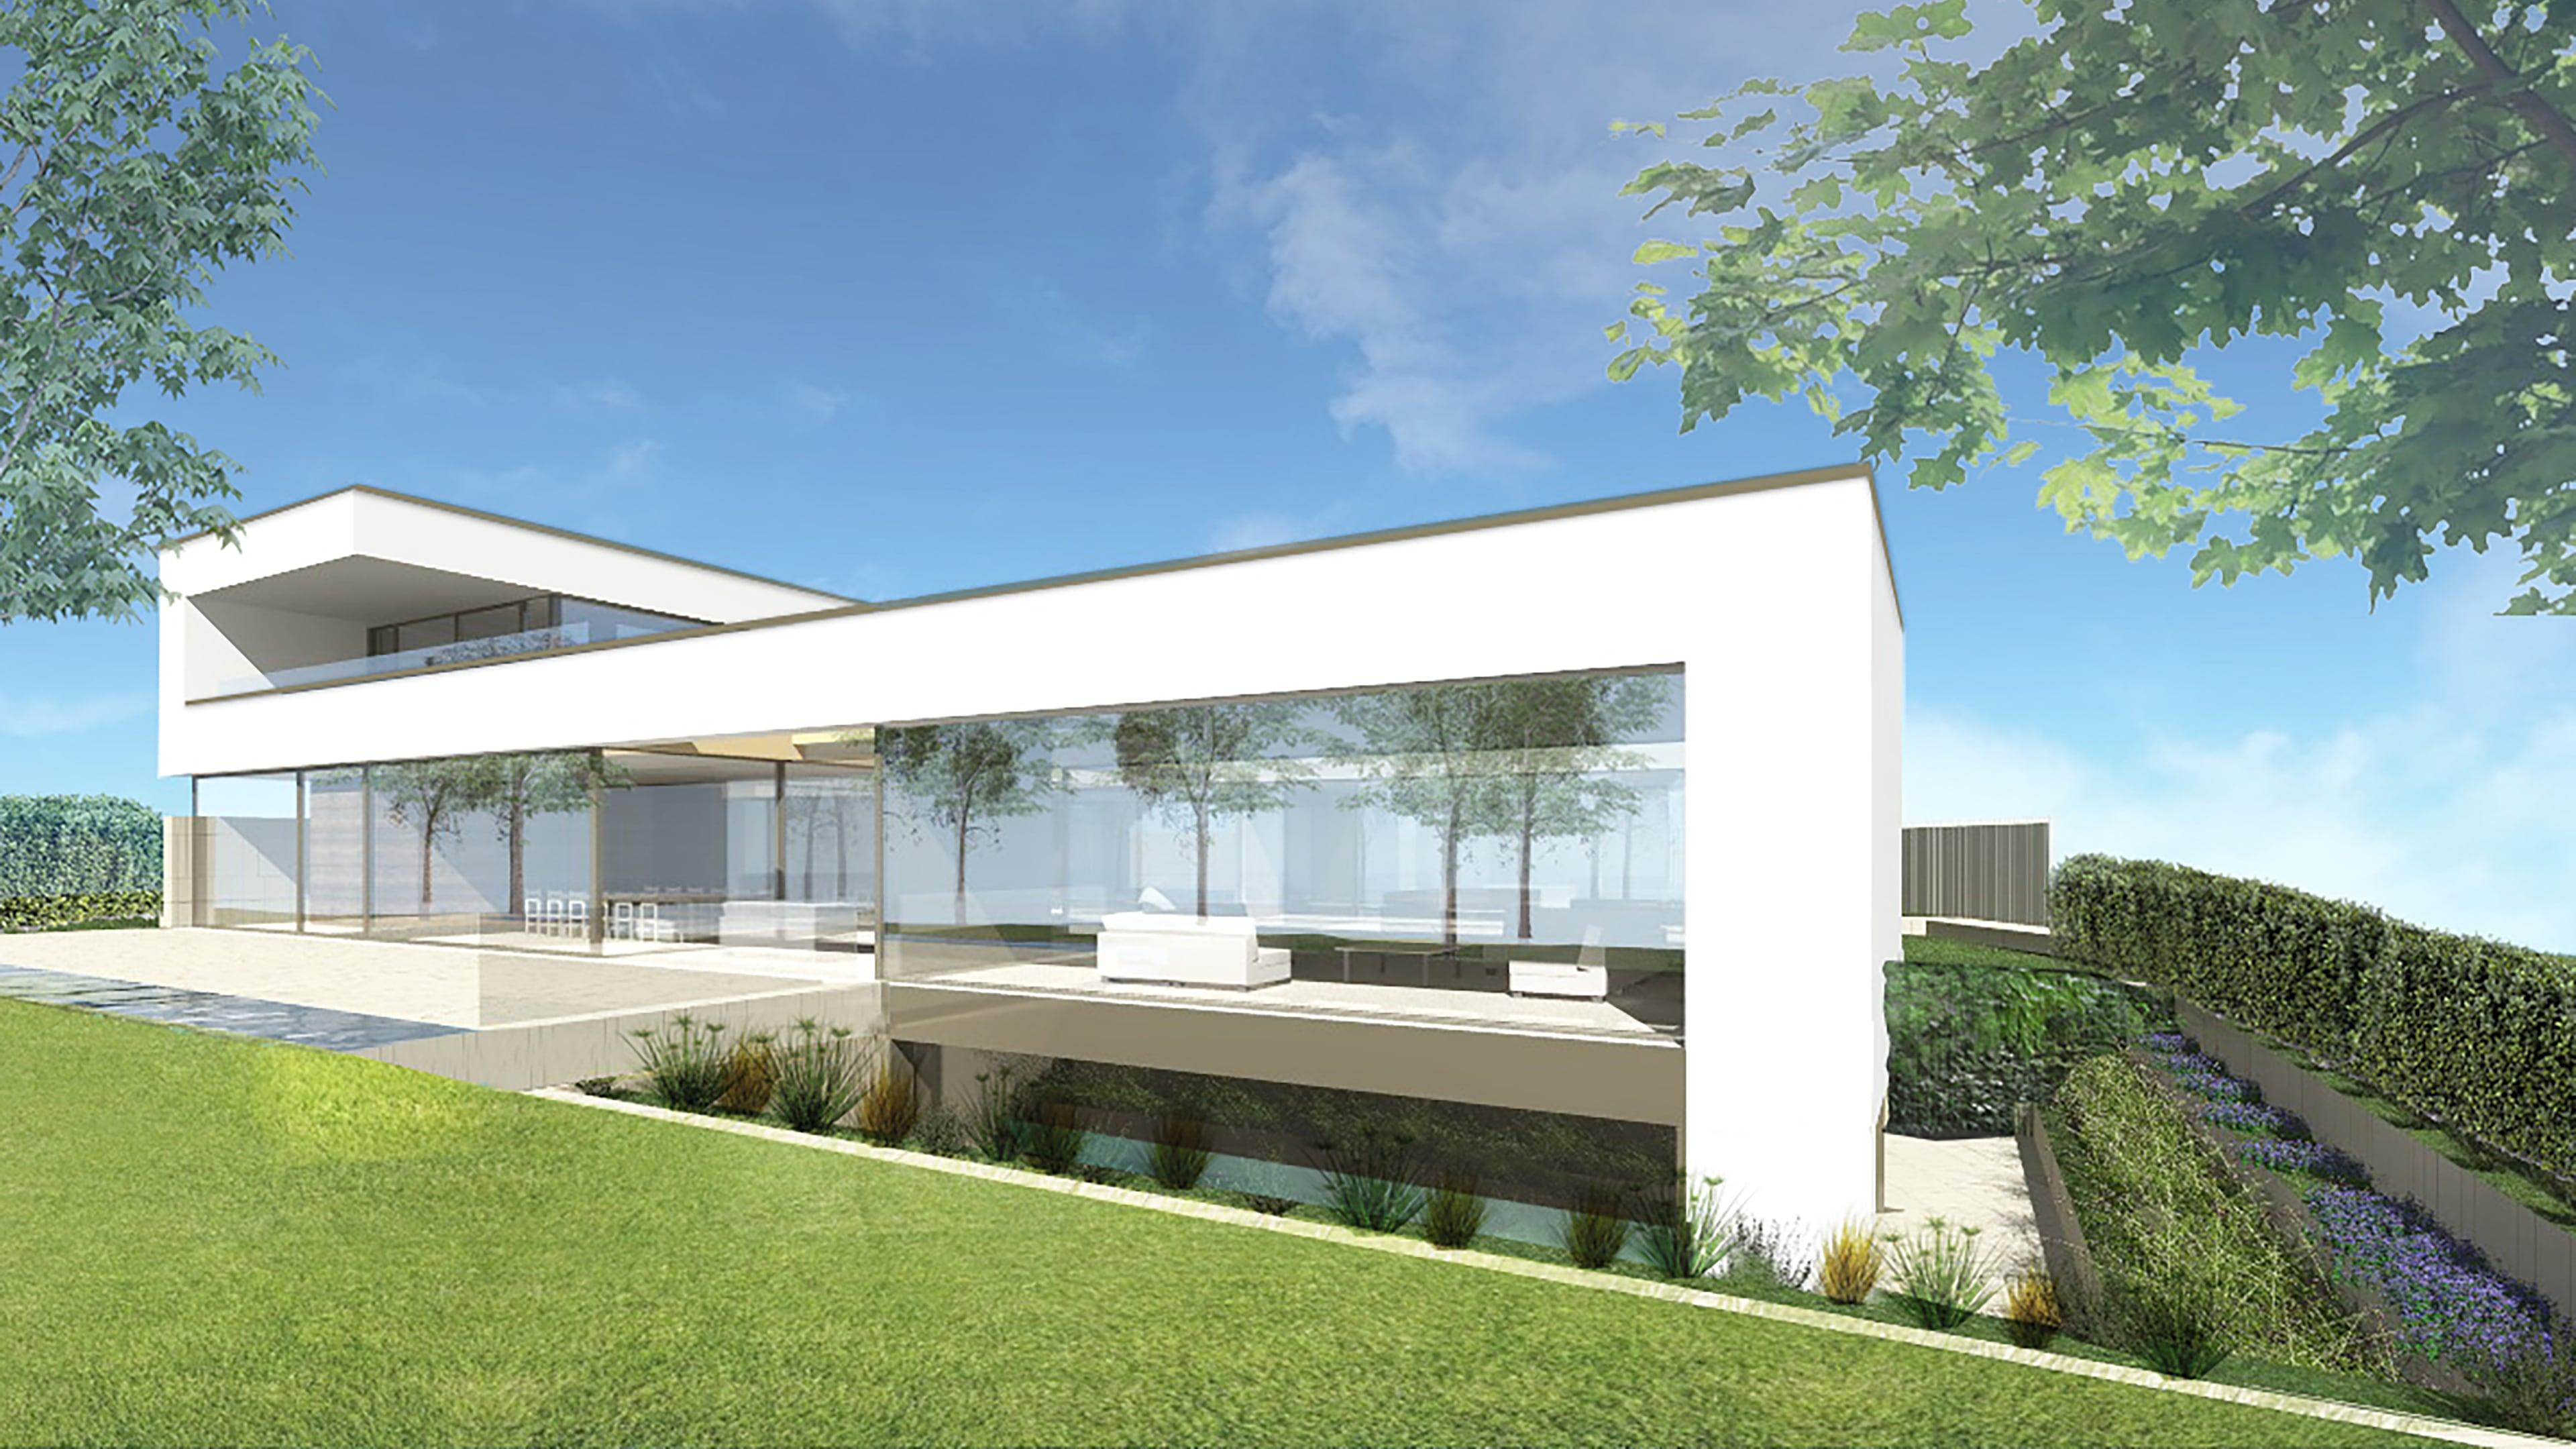 123-luxembourg-bridel-villa-house-luxe-luxury-pierre-stone-architecture-cfa-cfarchitectes-architecte-architect-investment-02